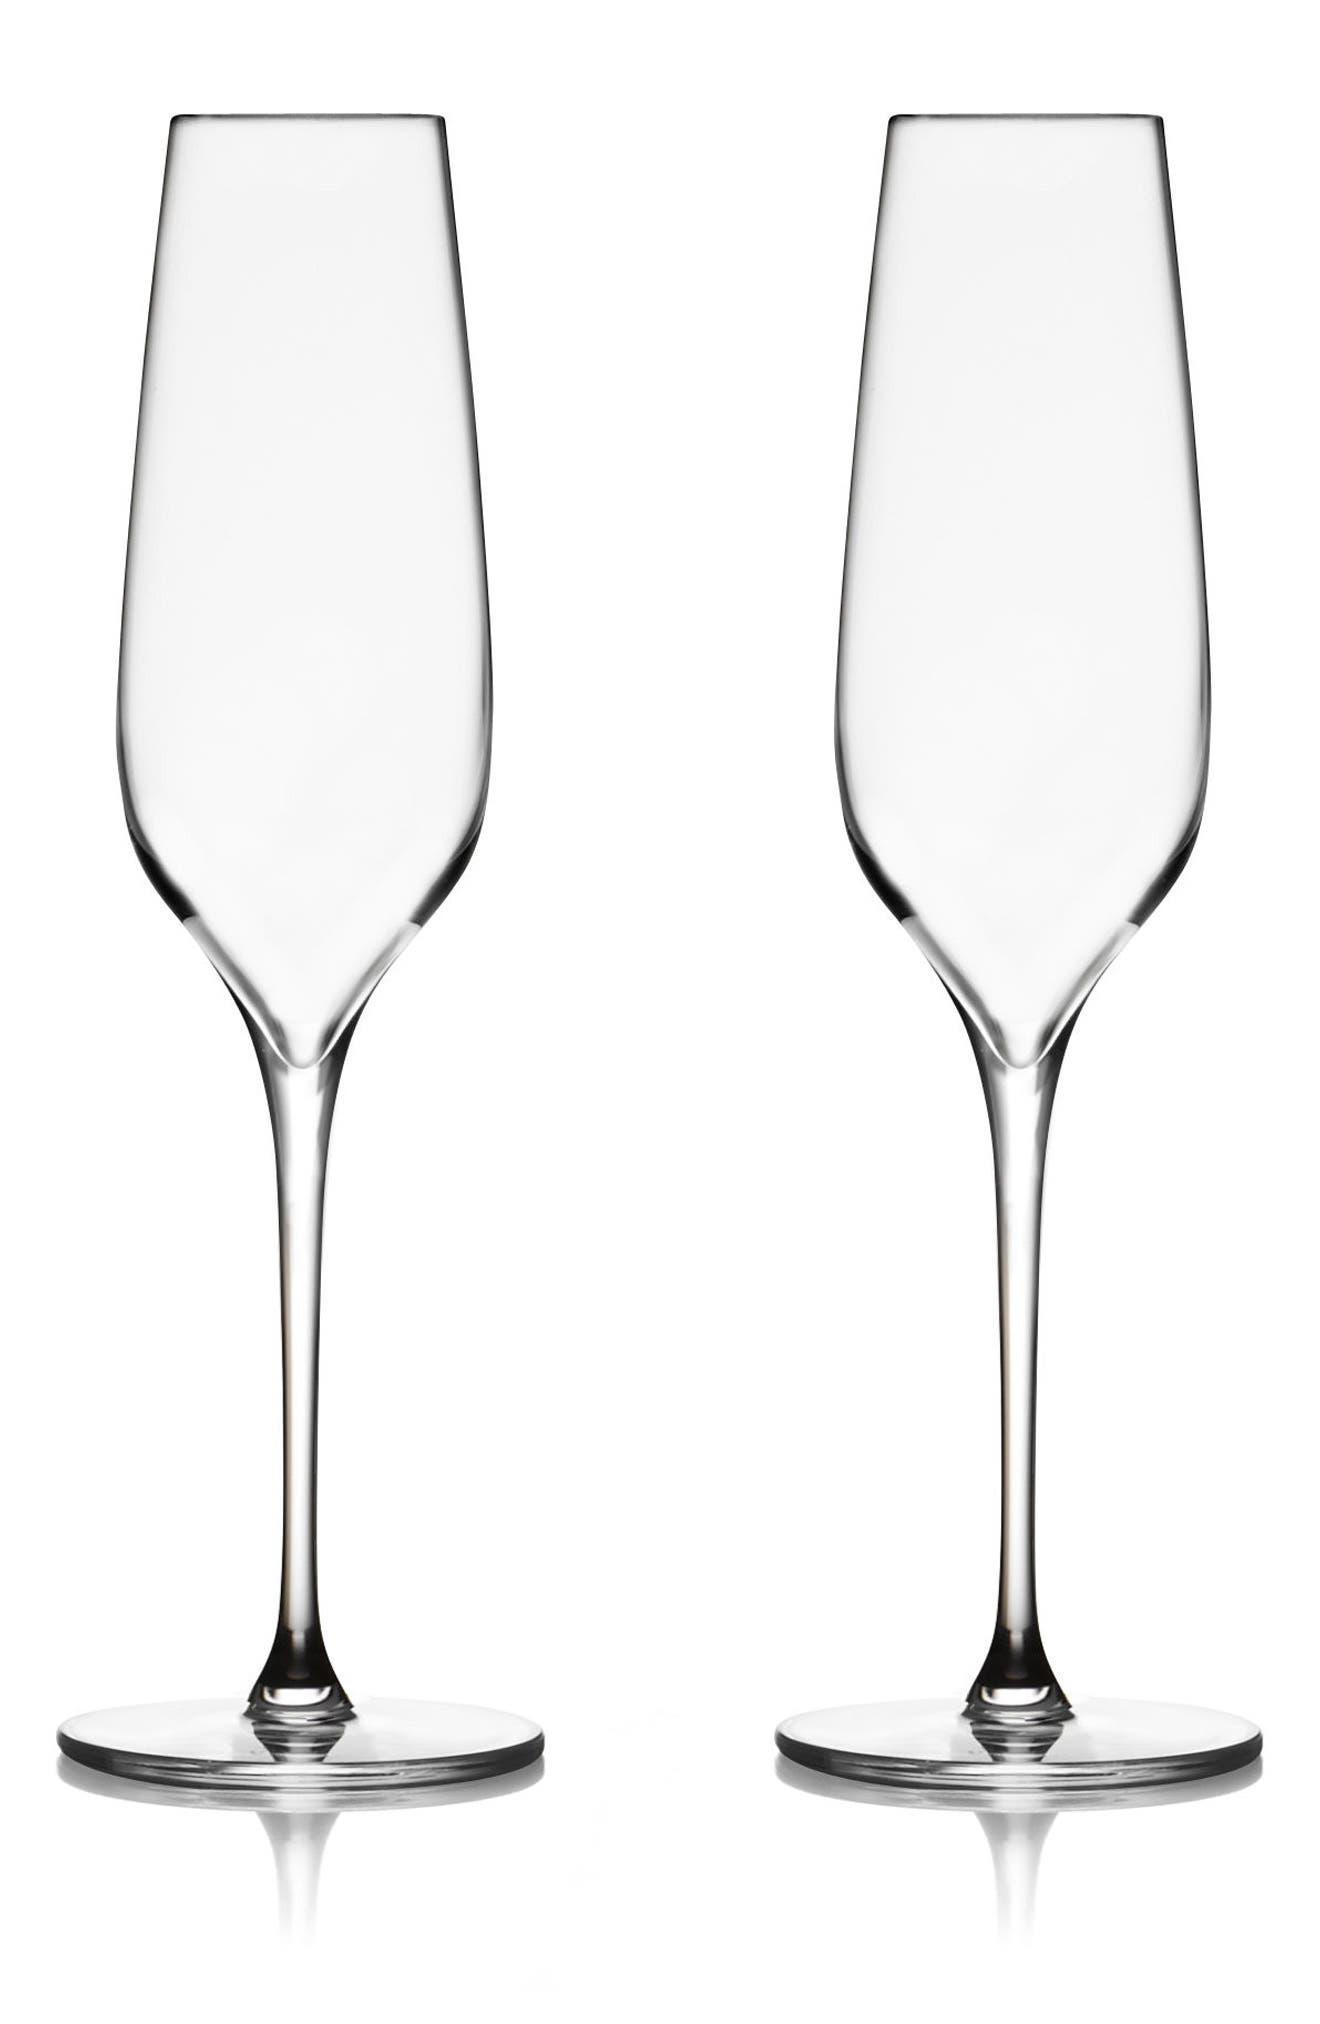 Image of Nambe Vie Champagne Flutes - Set of 2